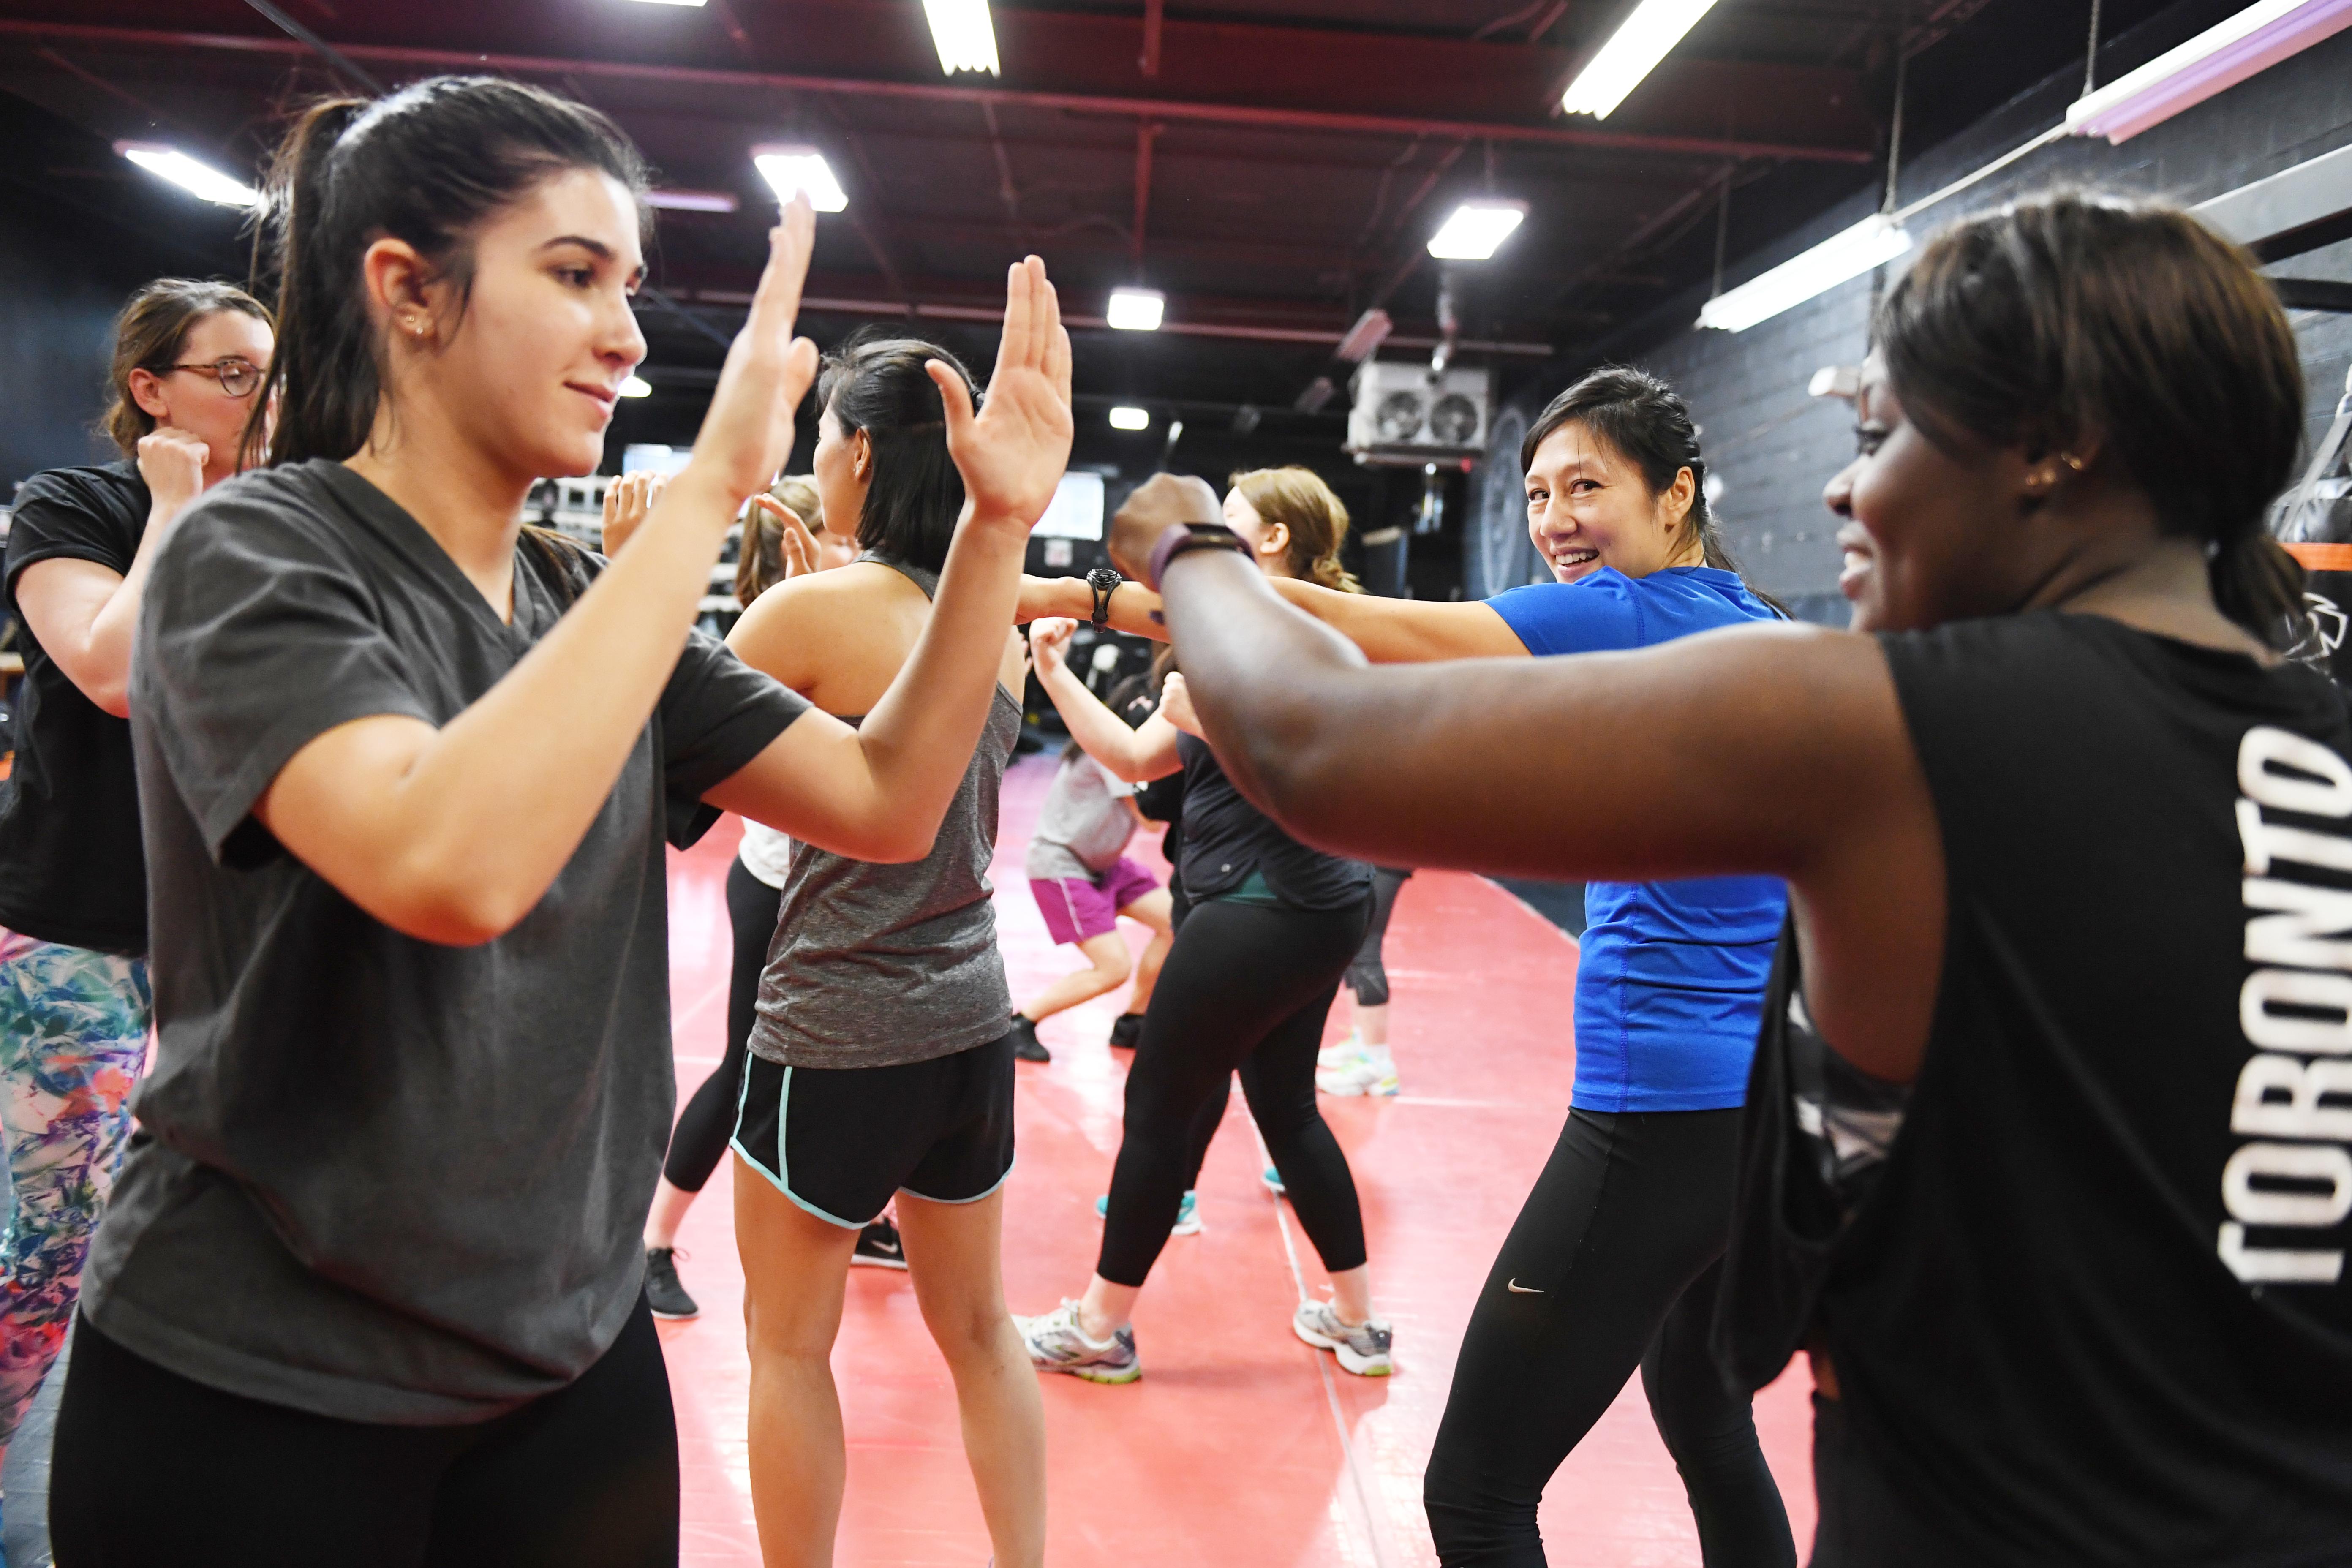 Women's Fitness Boxing Training